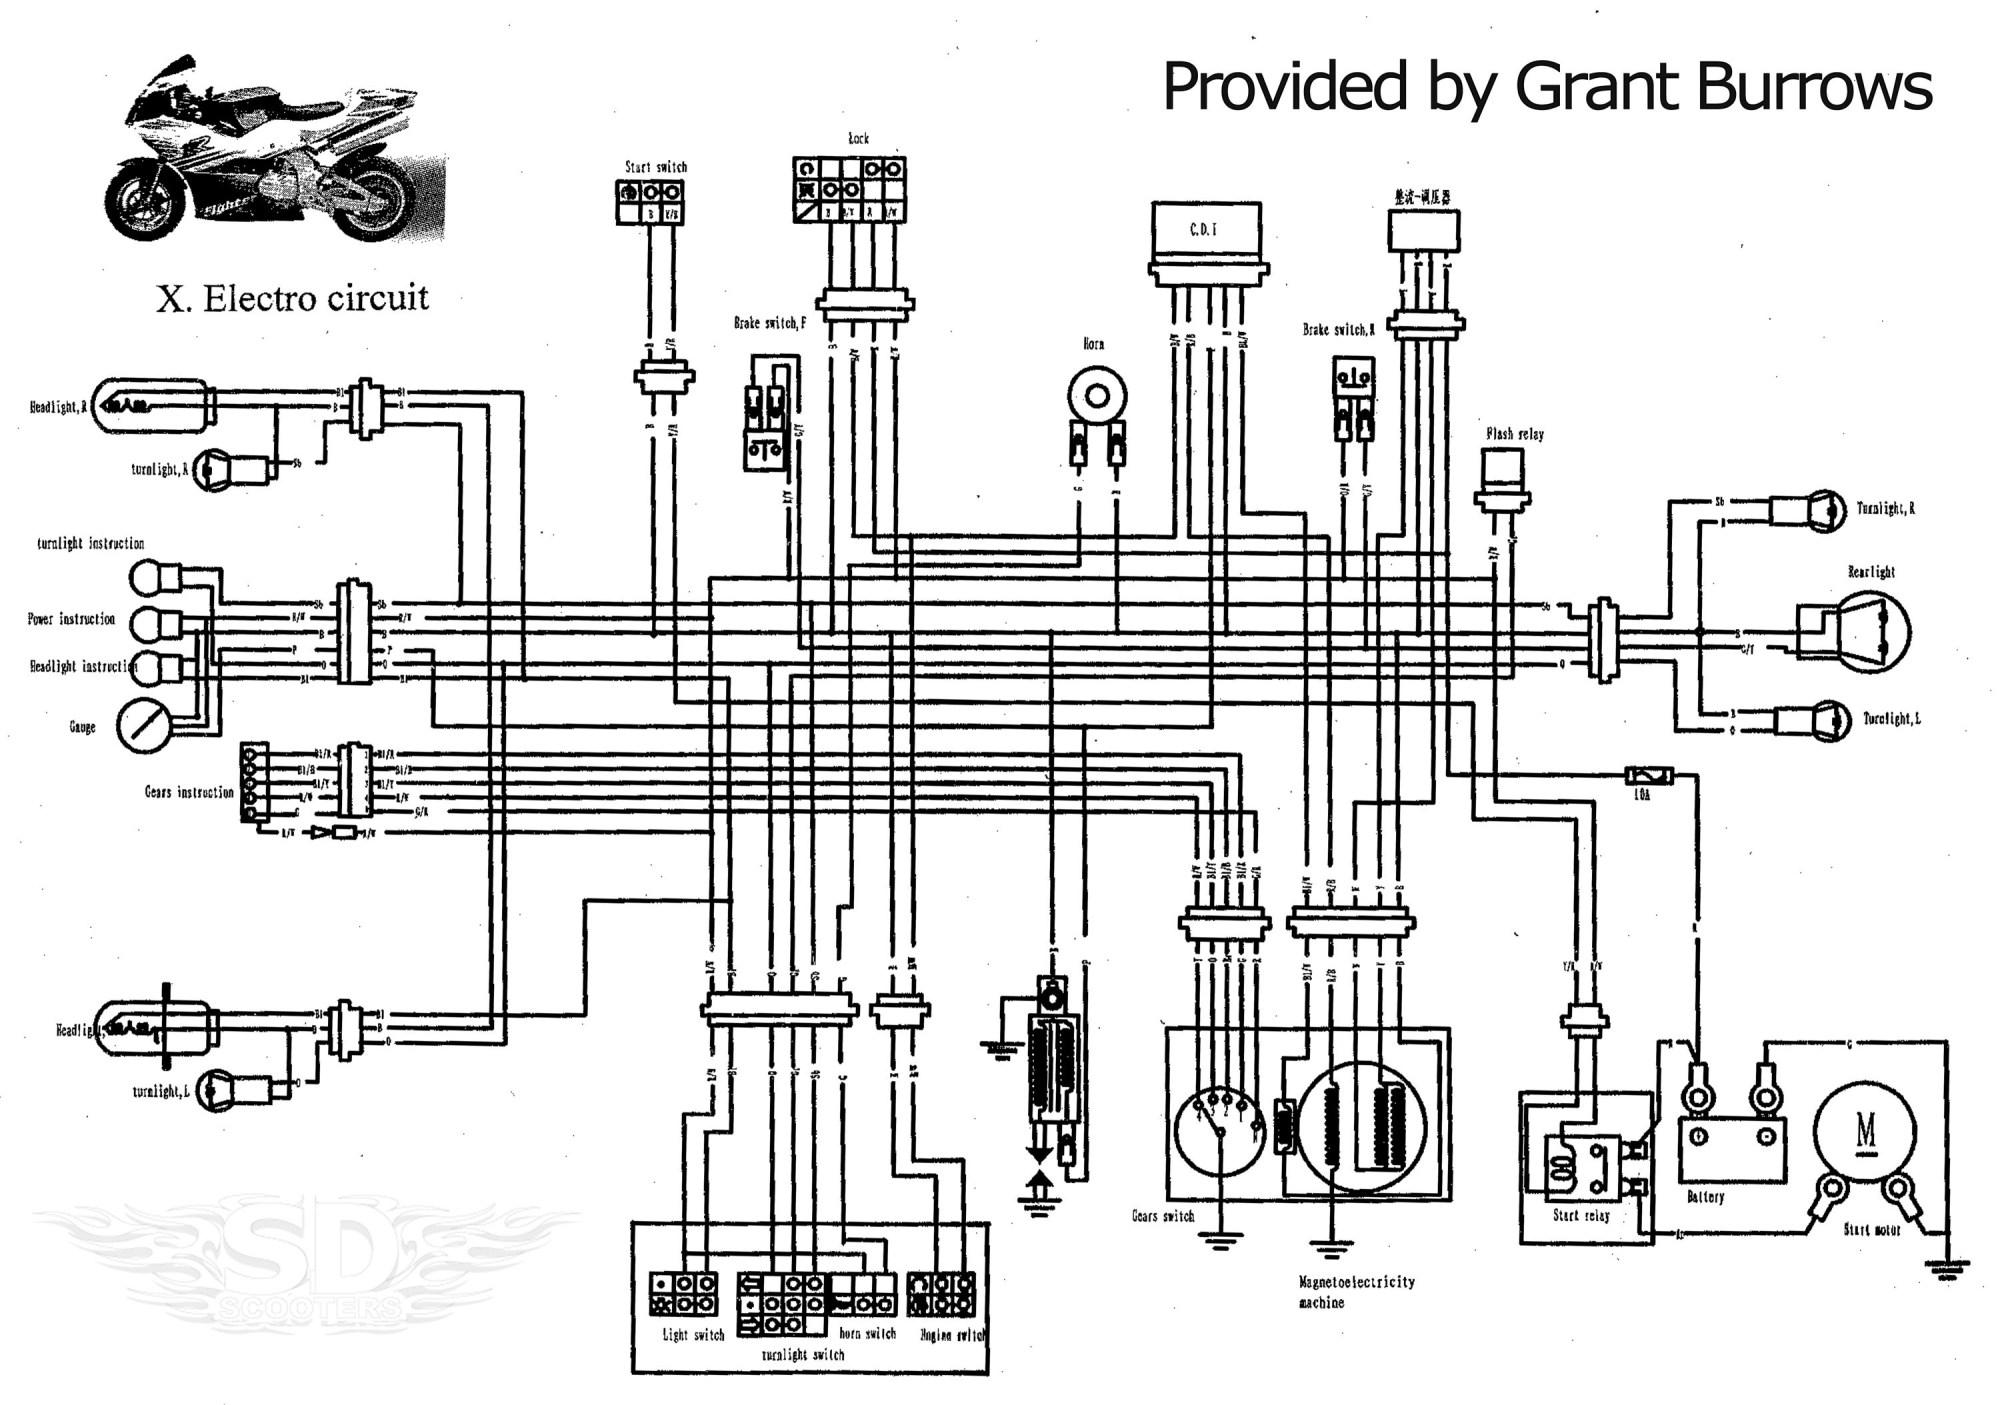 hight resolution of ct110 trail bike wiring diagram wiring diagram expert c100 wiring diagram ct110 trail bike wiring diagram